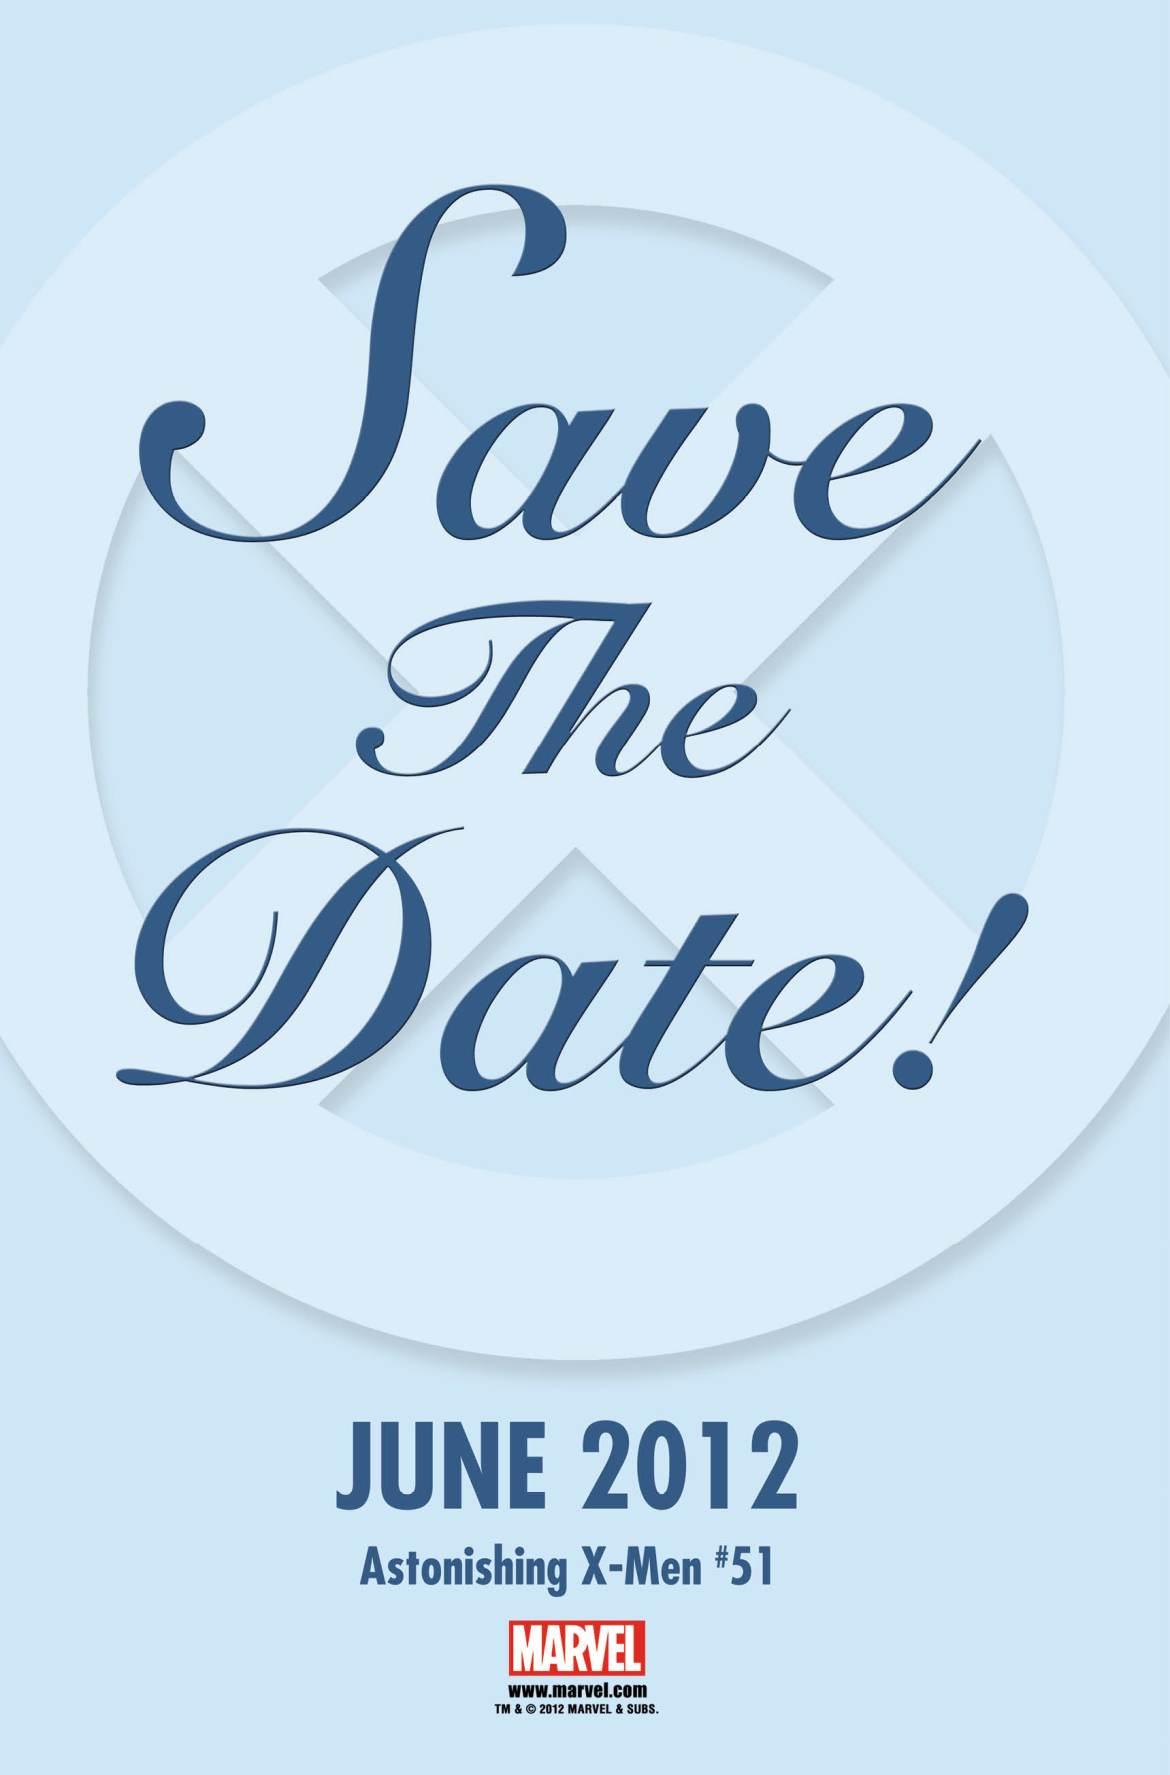 SaveTheDate1 ASTONISHING X-MEN #51: Save The Date - June 2012